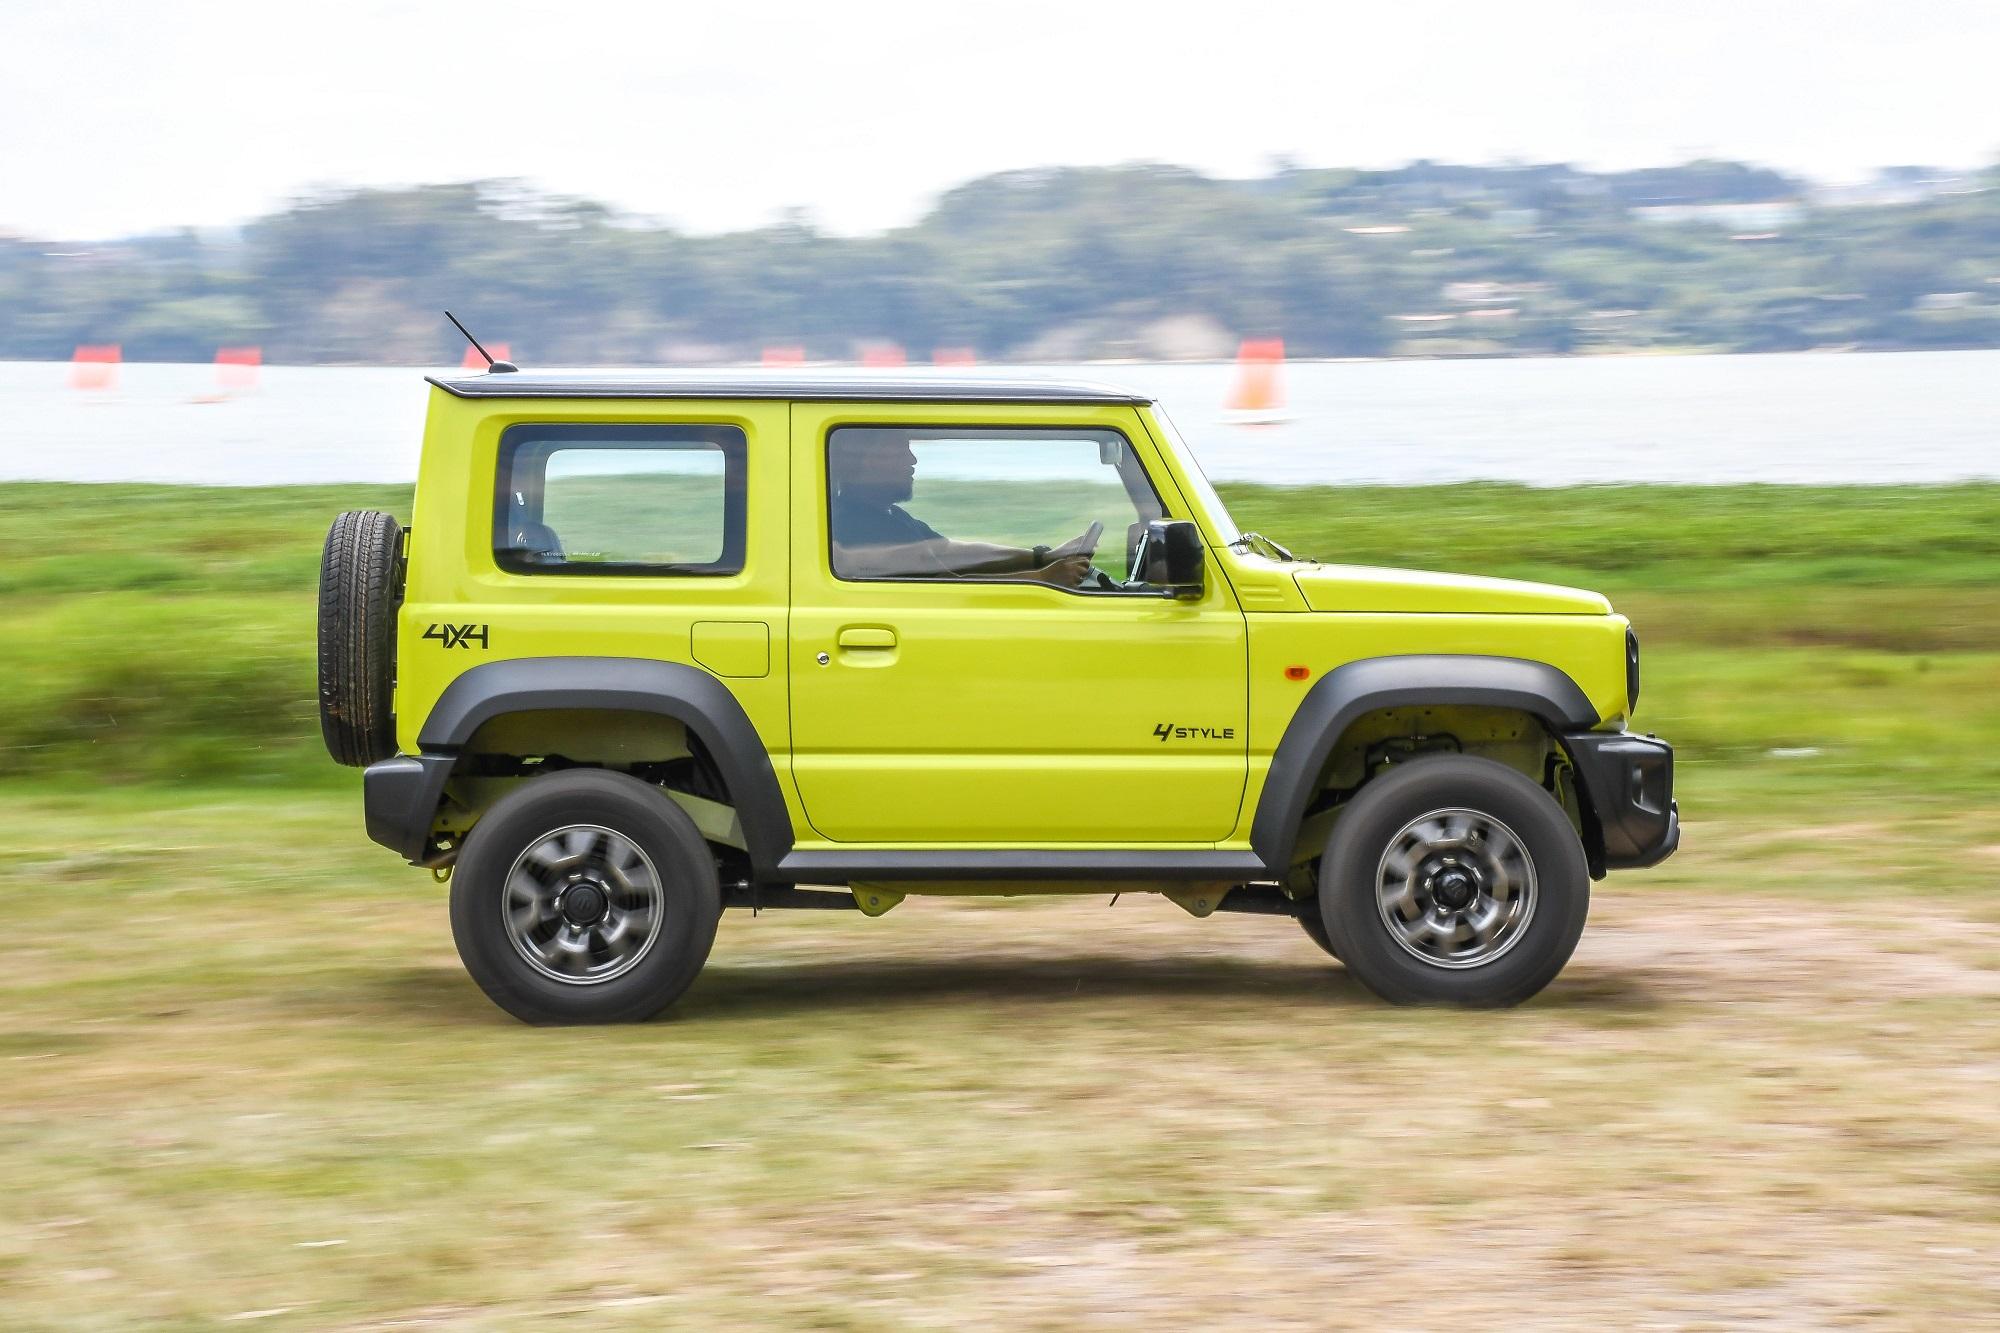 Suzuki Jimny verde de perfil em movimento na grama